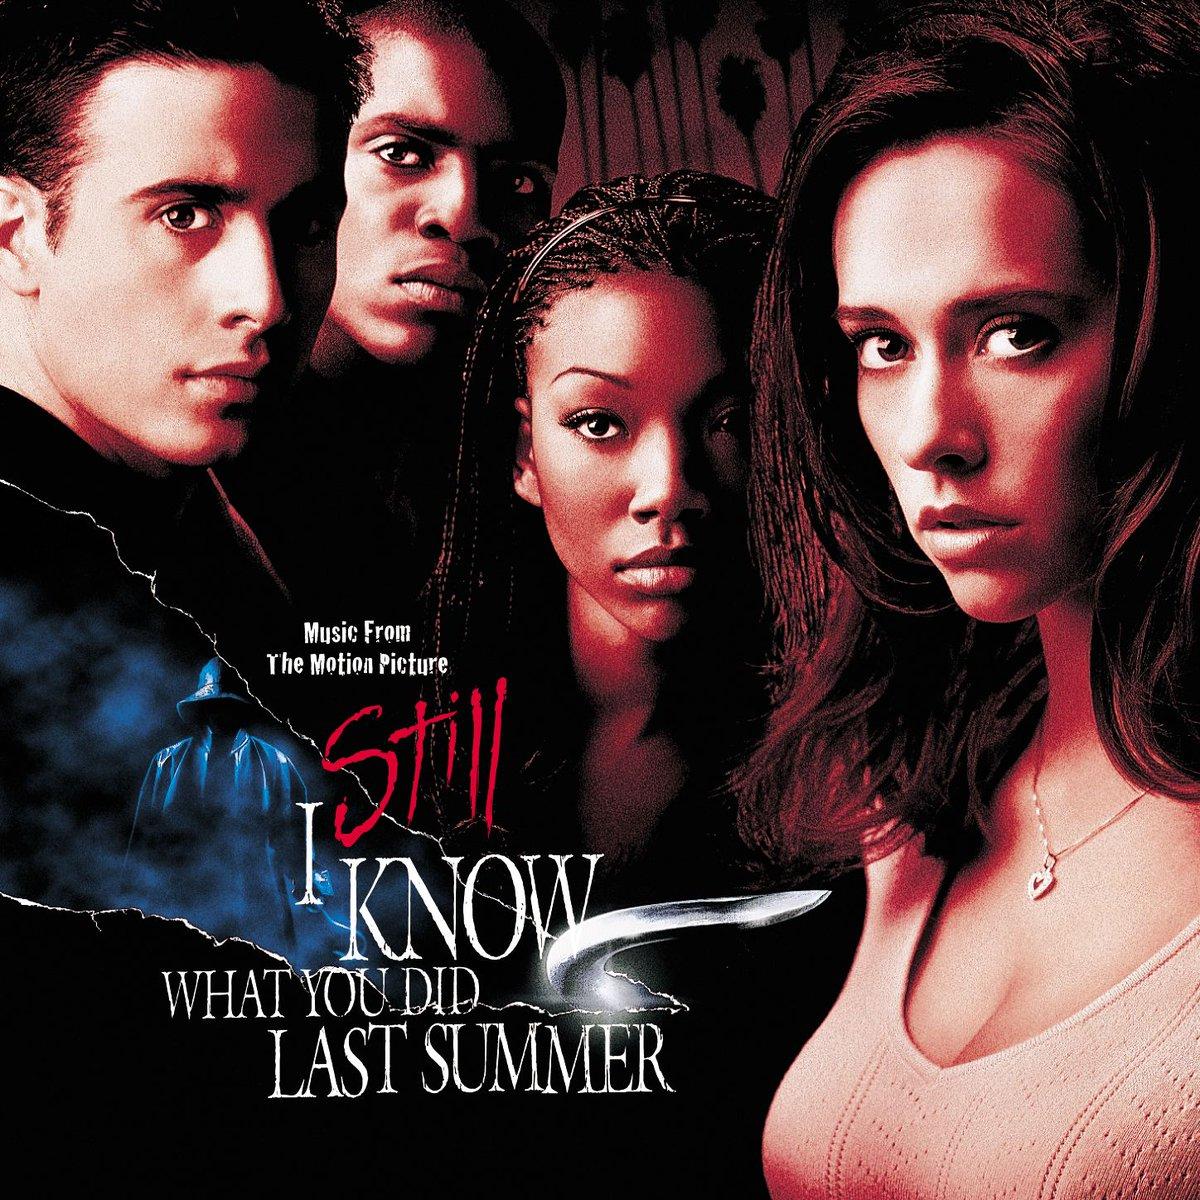 "Who else remembers & loves Jennifer Love Hewitt's 1999 bop ""How Do I Deal"" from 'I Still Know What You Did Last Summer'? https://t.co/REwqWtWFgm https://t.co/vOx6E4UPKV"